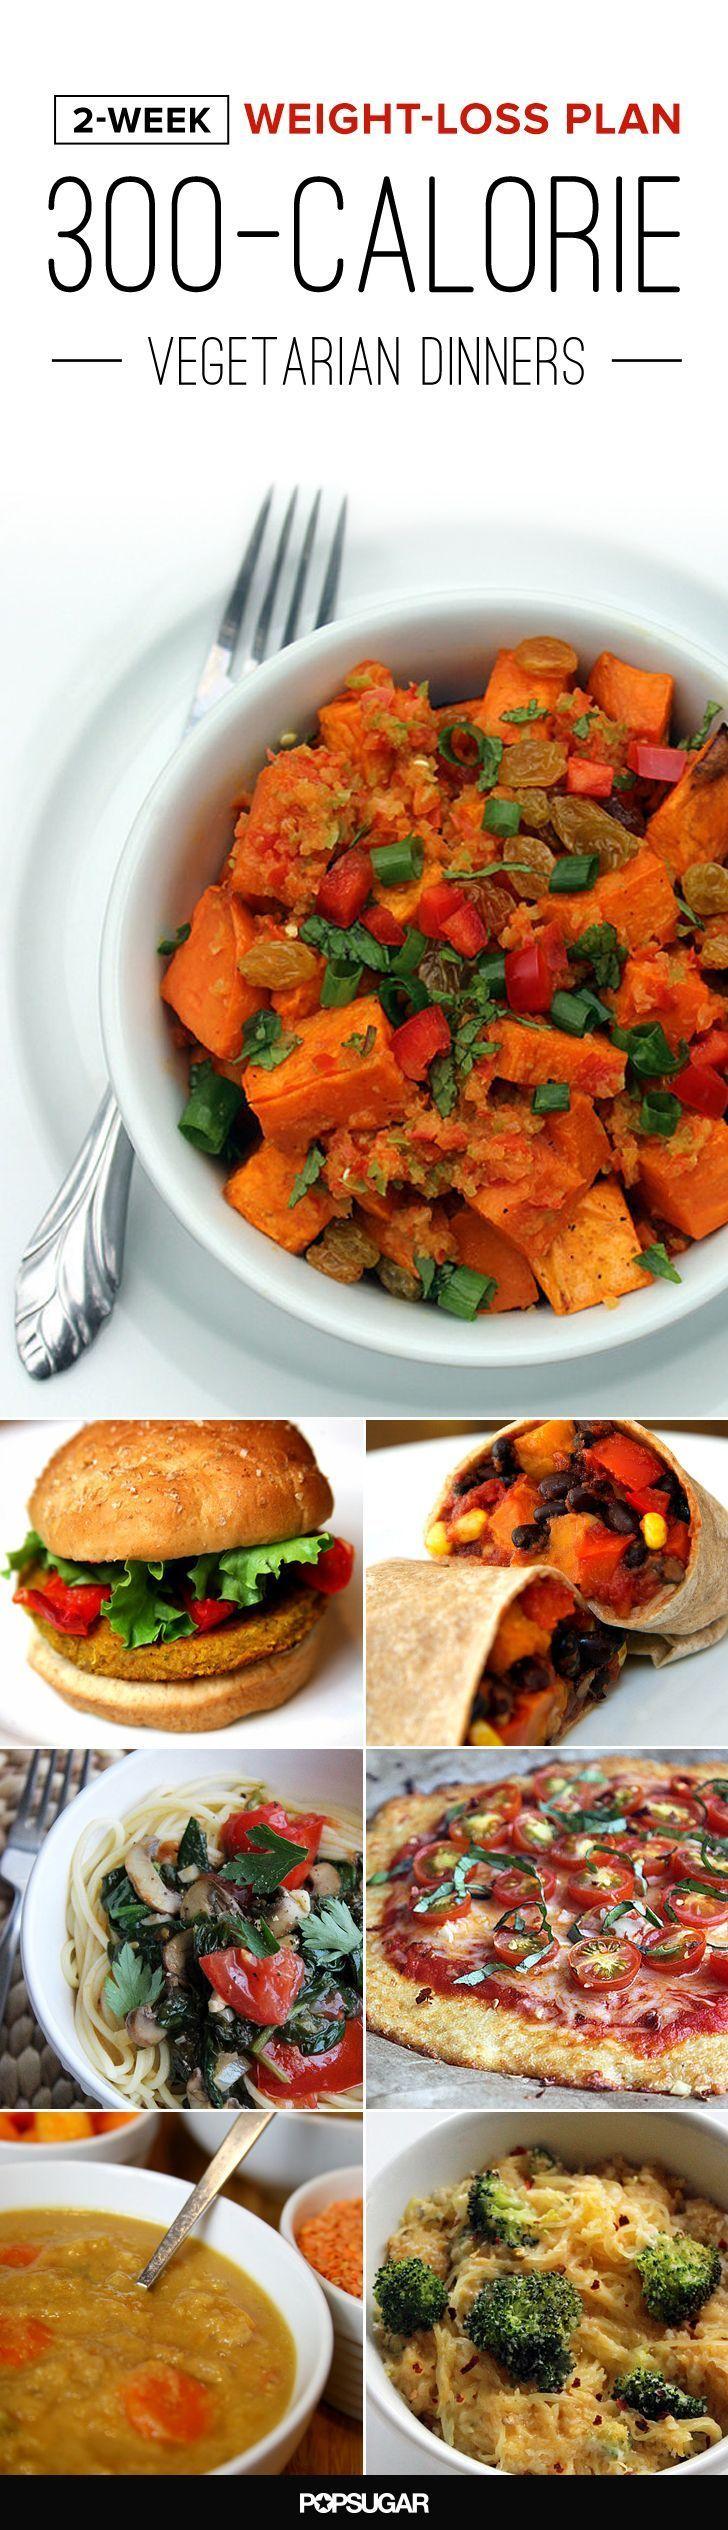 2 Week Weight Loss Plan: Vegetarian Dinners Under 300 Calories fast dinners fast dinner recipes #recipe #dinner